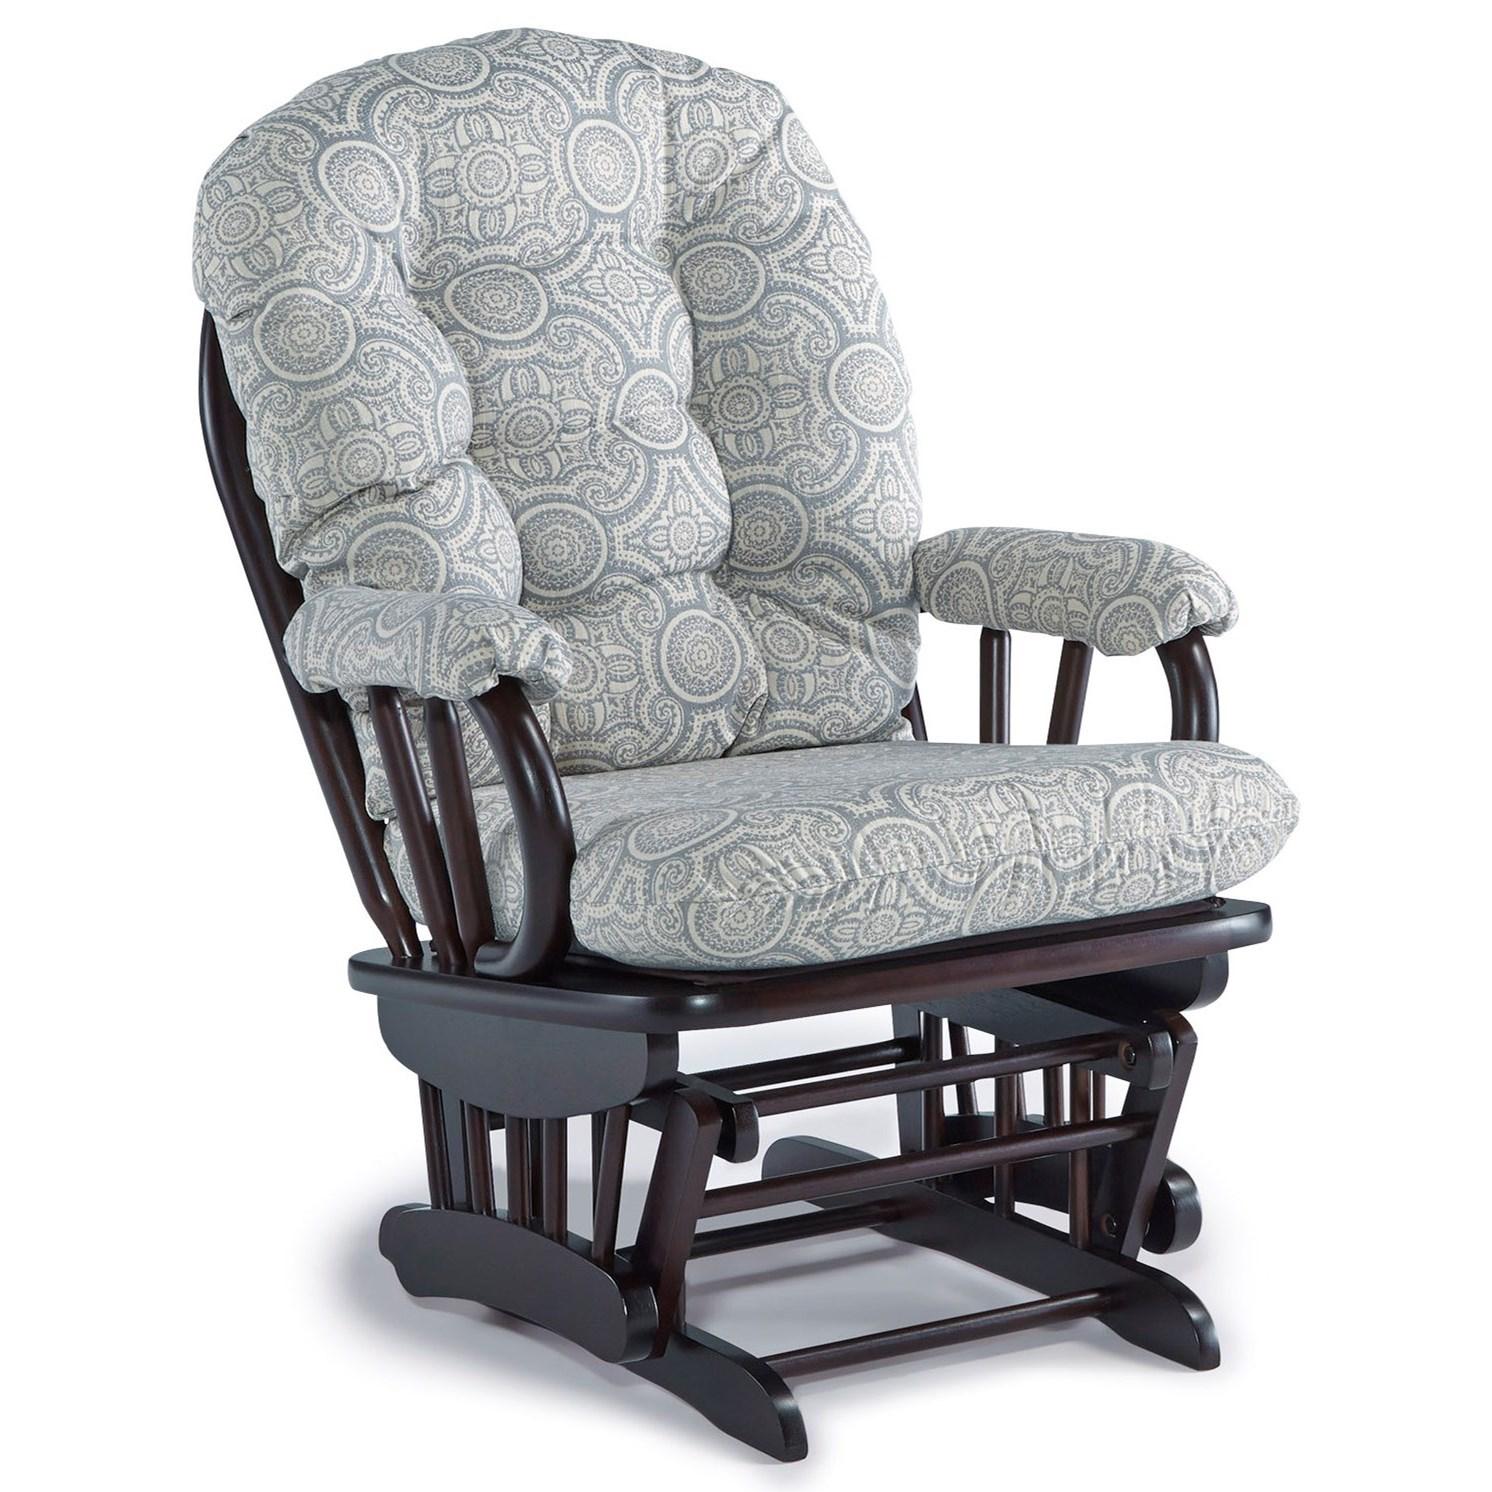 Sona Glider Rocker by Best Home Furnishings at Van Hill Furniture